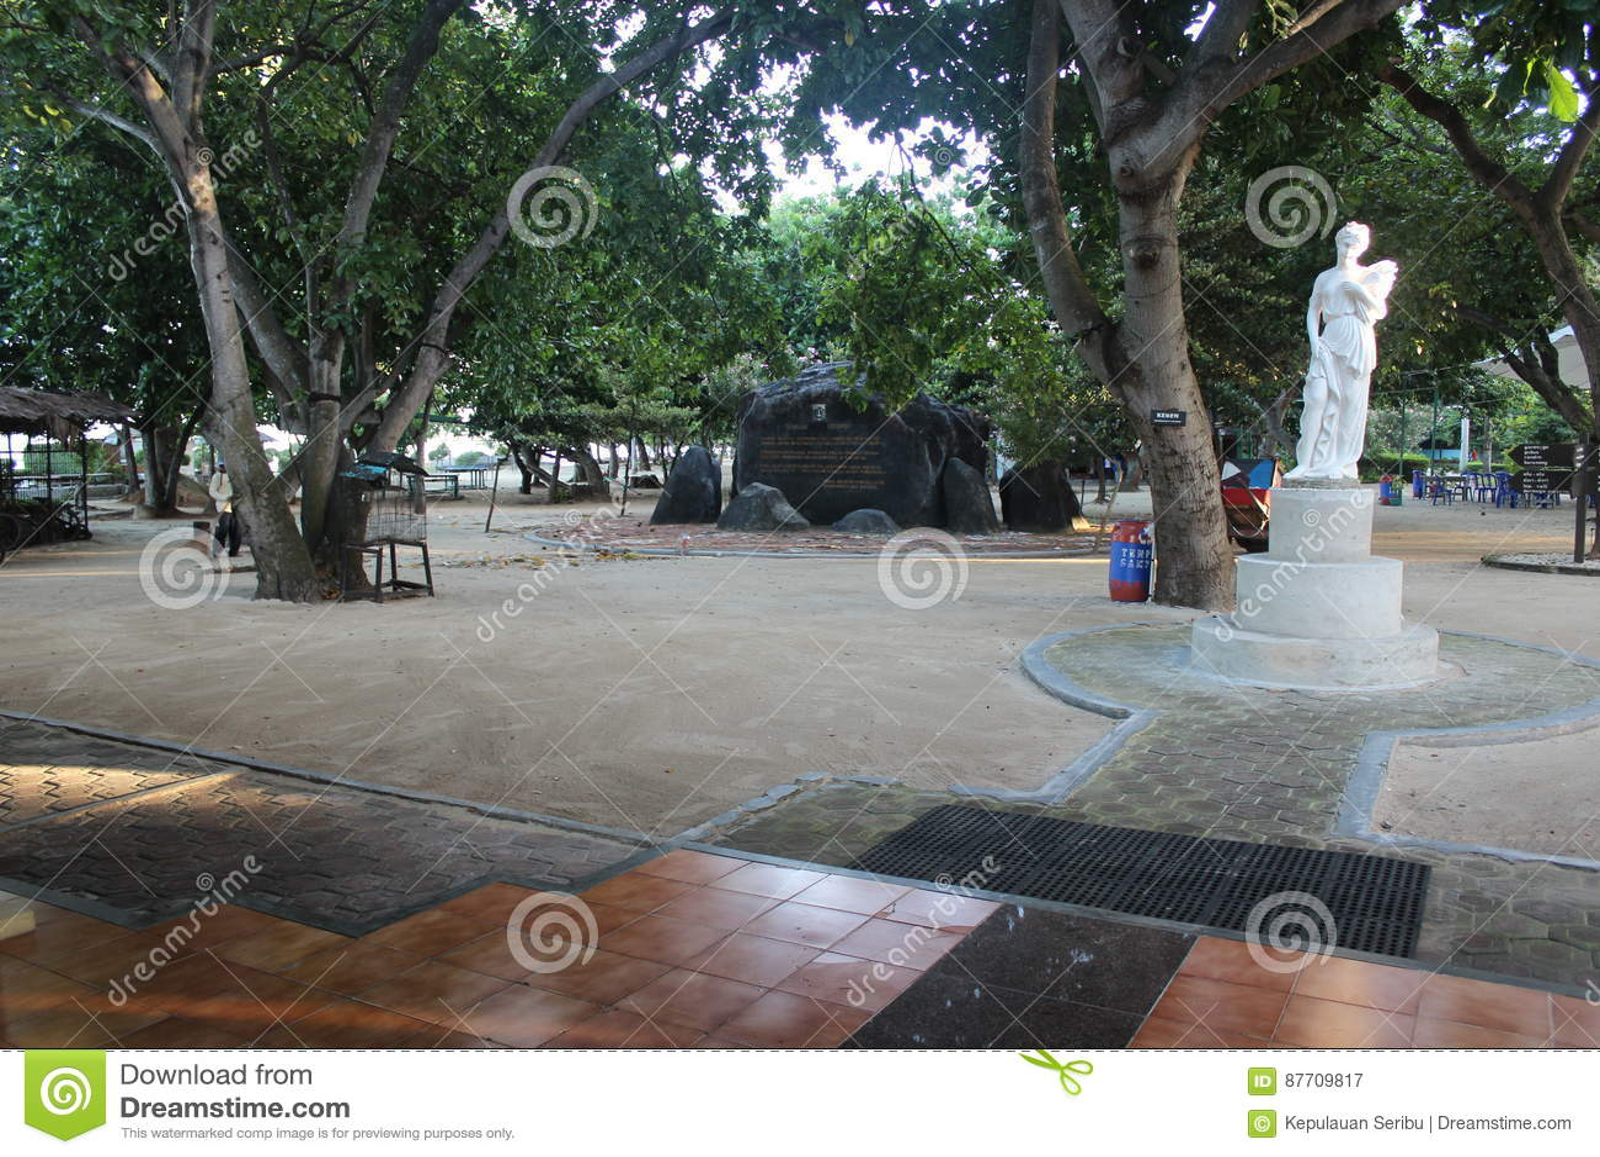 Station de vacances de Pulau Bidadari